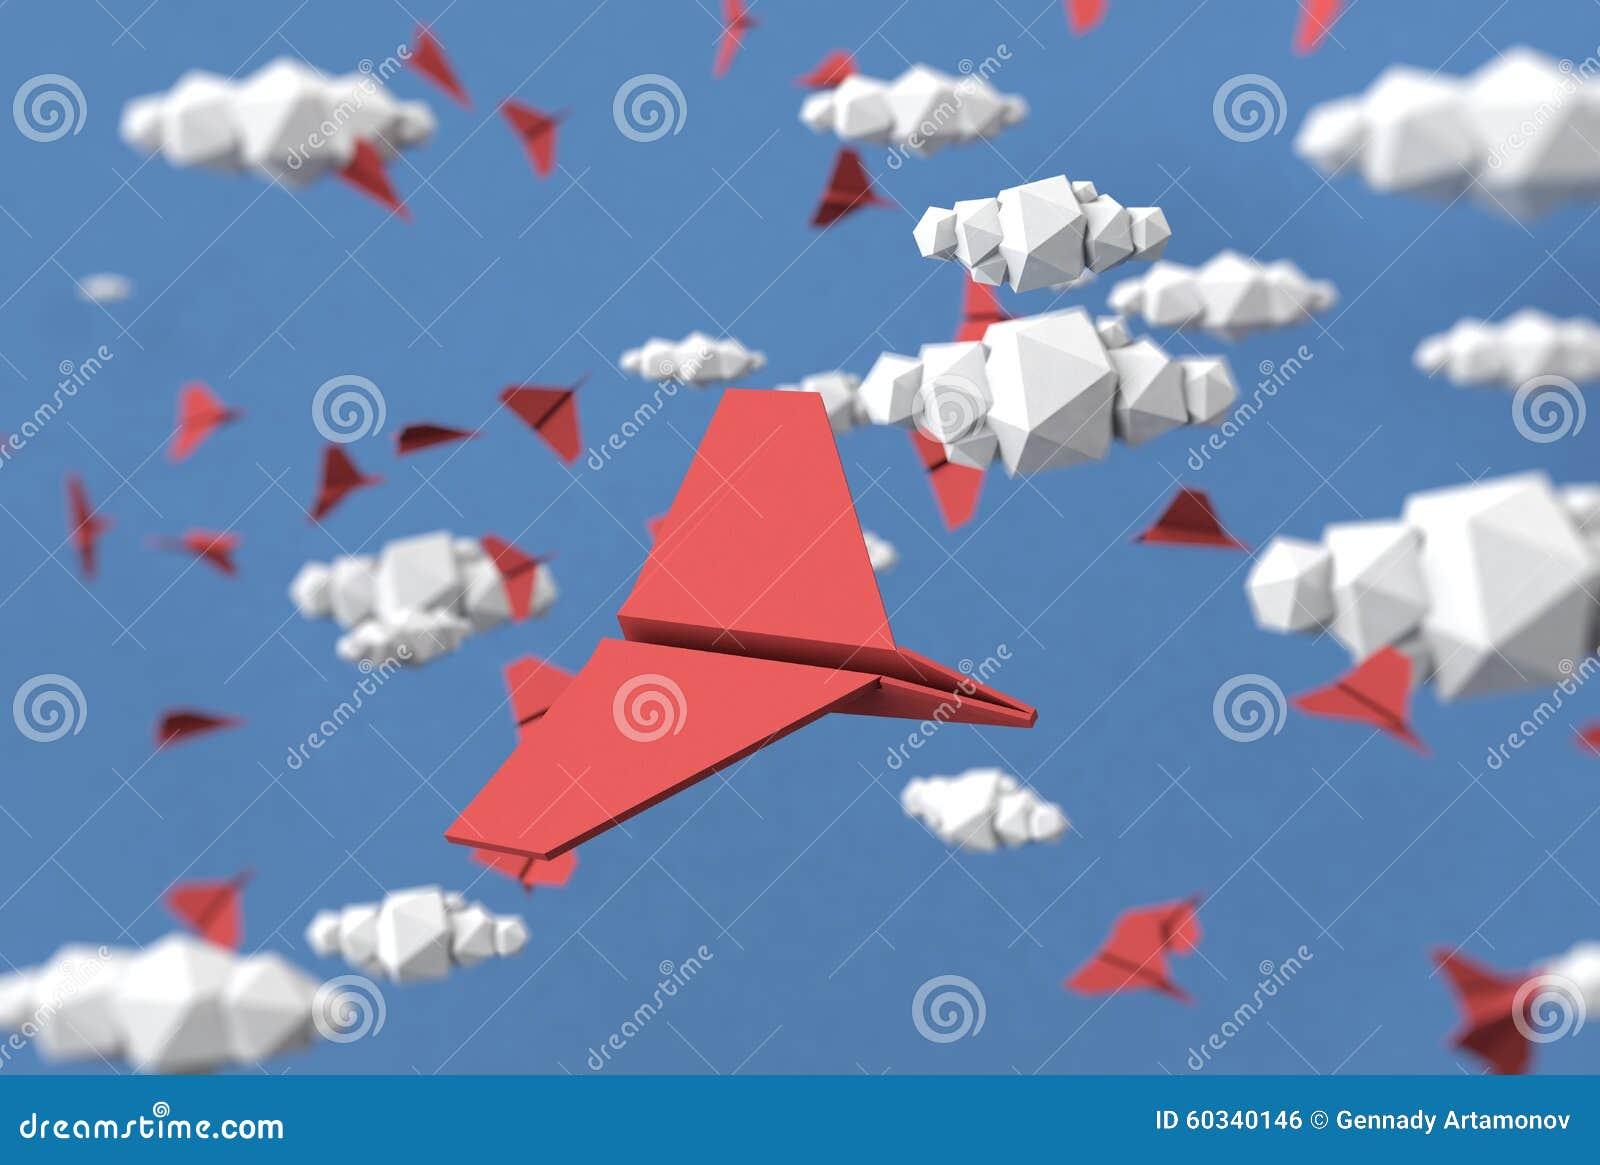 paper plane stock illustration -#main